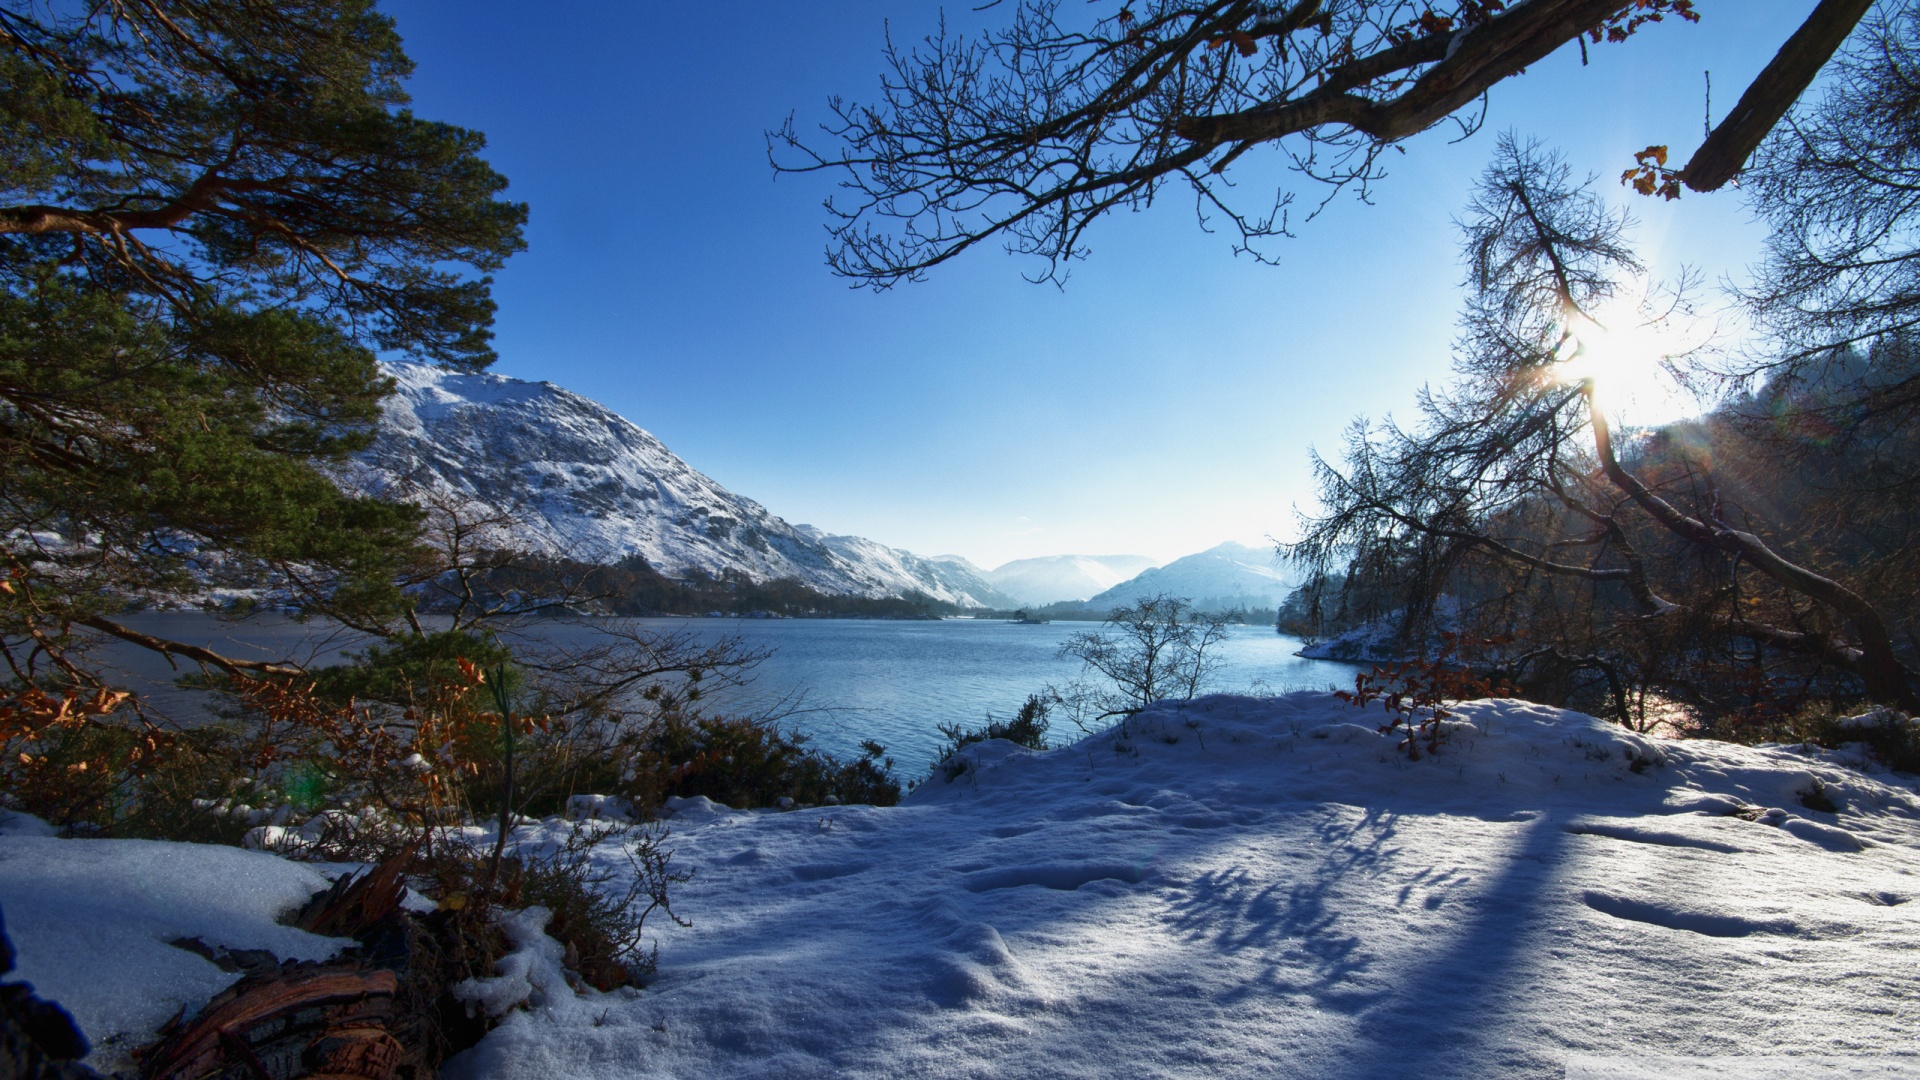 winter wallpaper sunshine mountain images 1920x1080 1920x1080